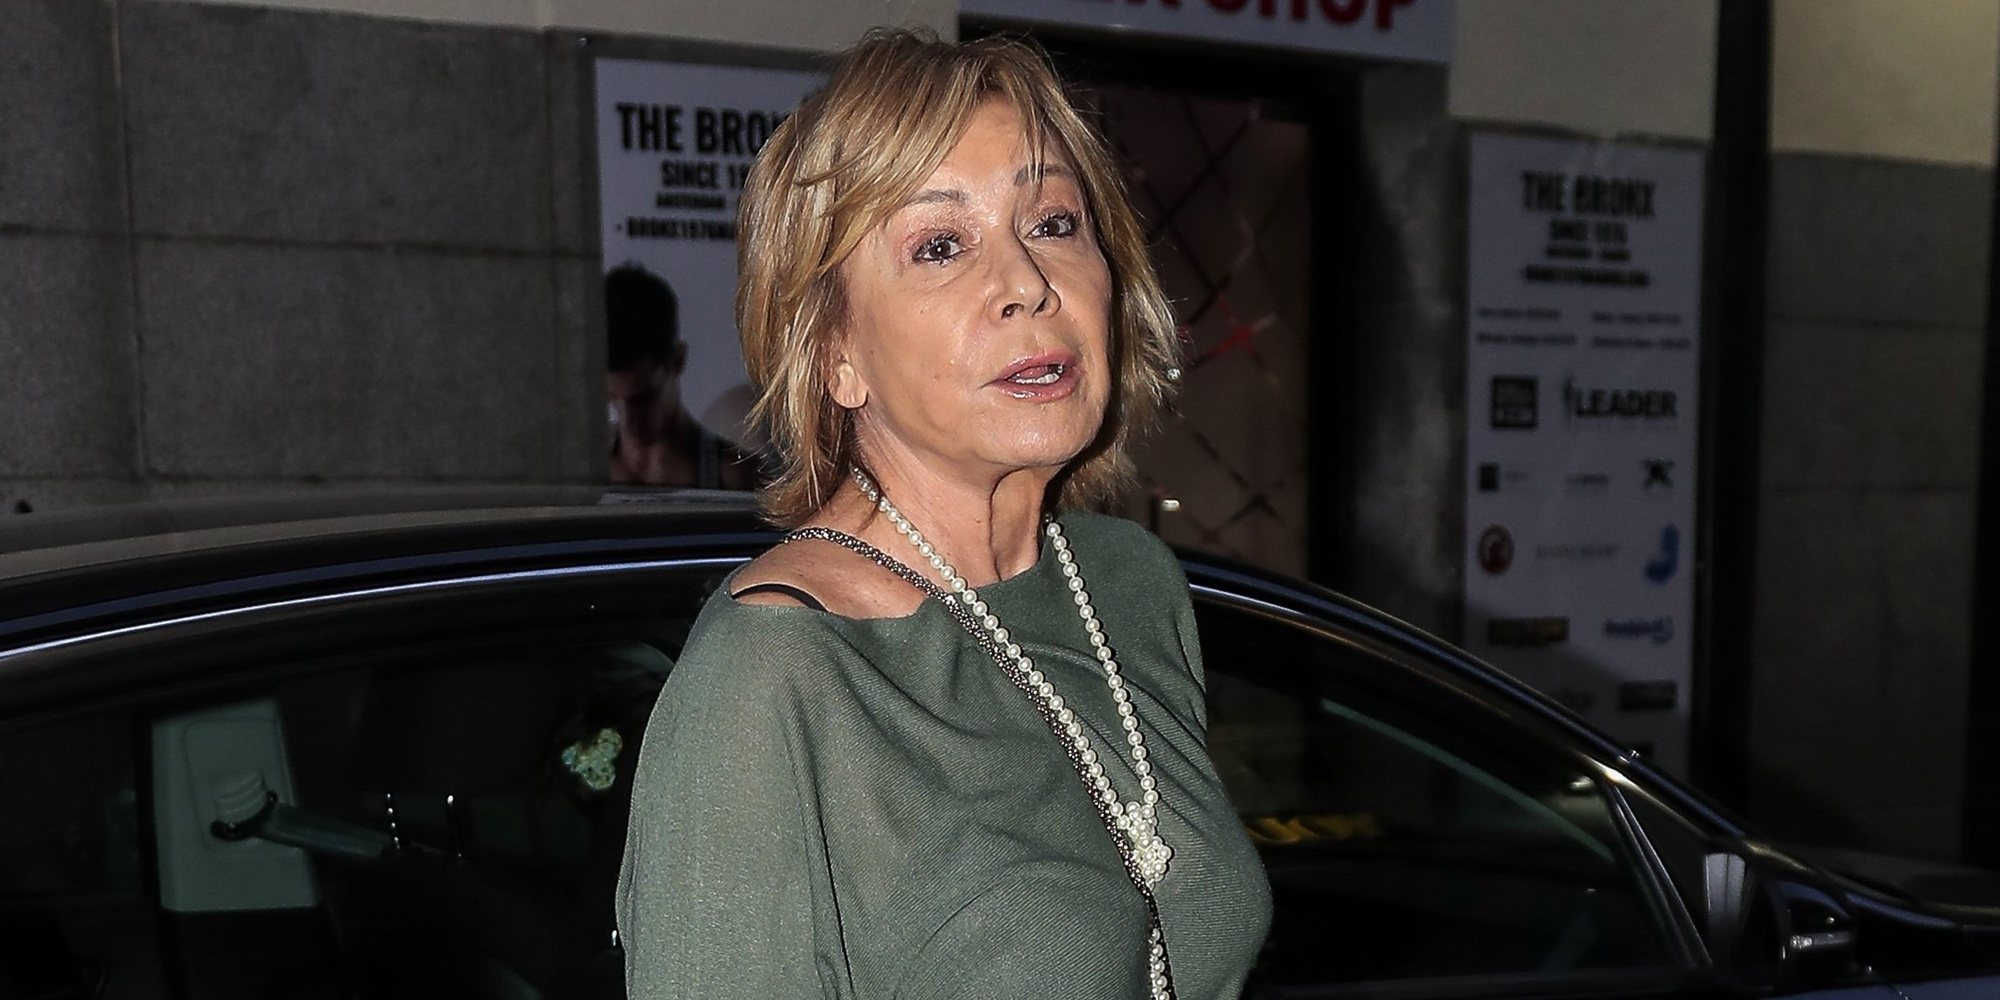 El lapsus de Mila Ximénez que confirma que Chelo García Cortés irá a 'Supervivientes 2019'